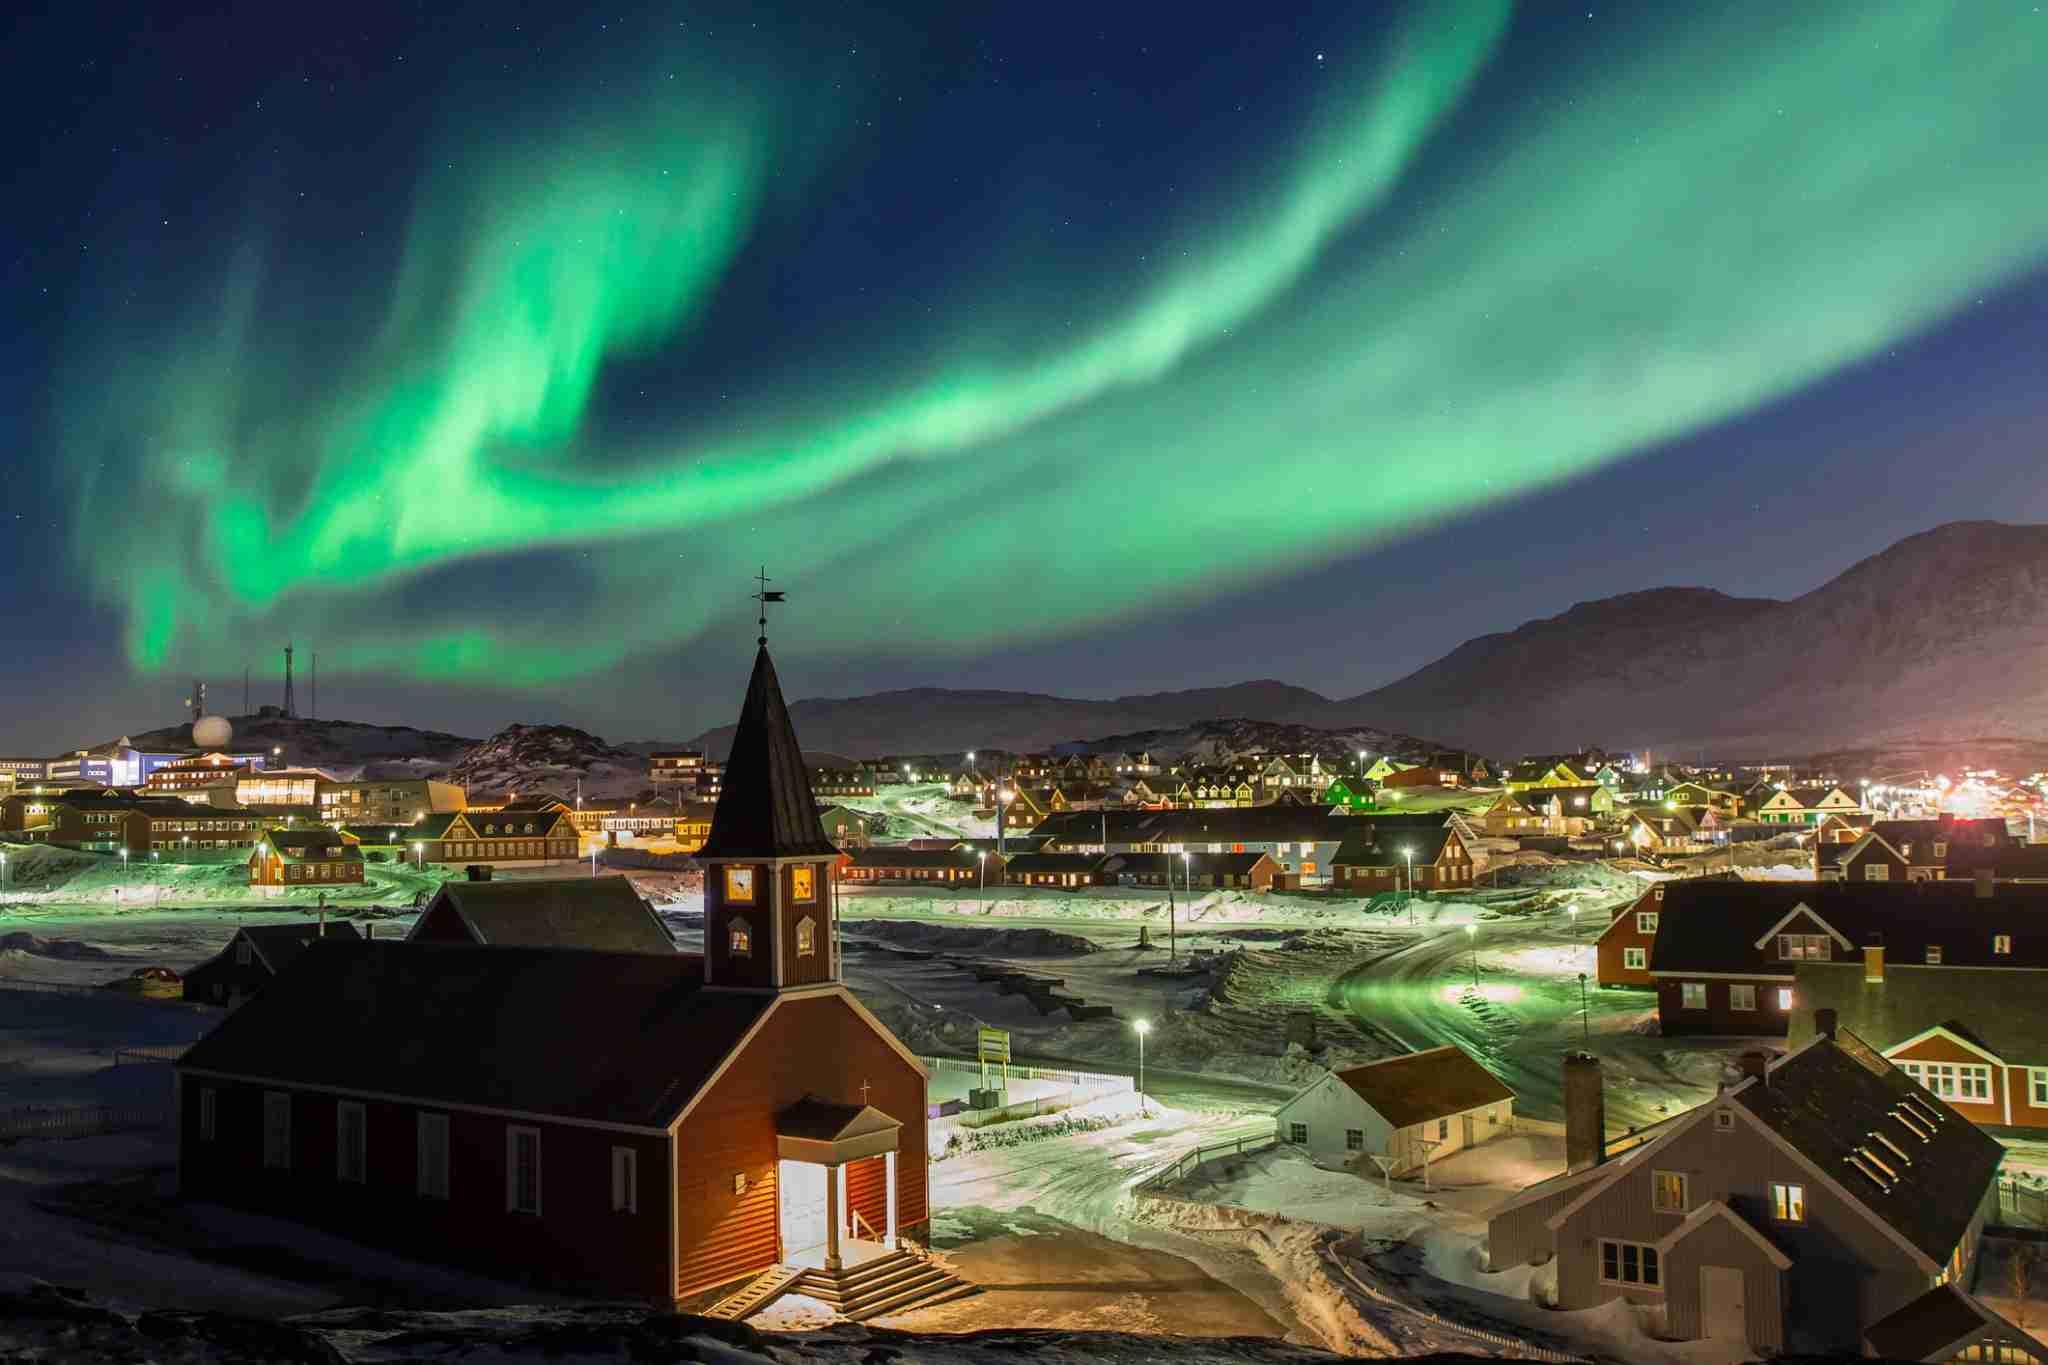 Nuuk, Greenland northern lights